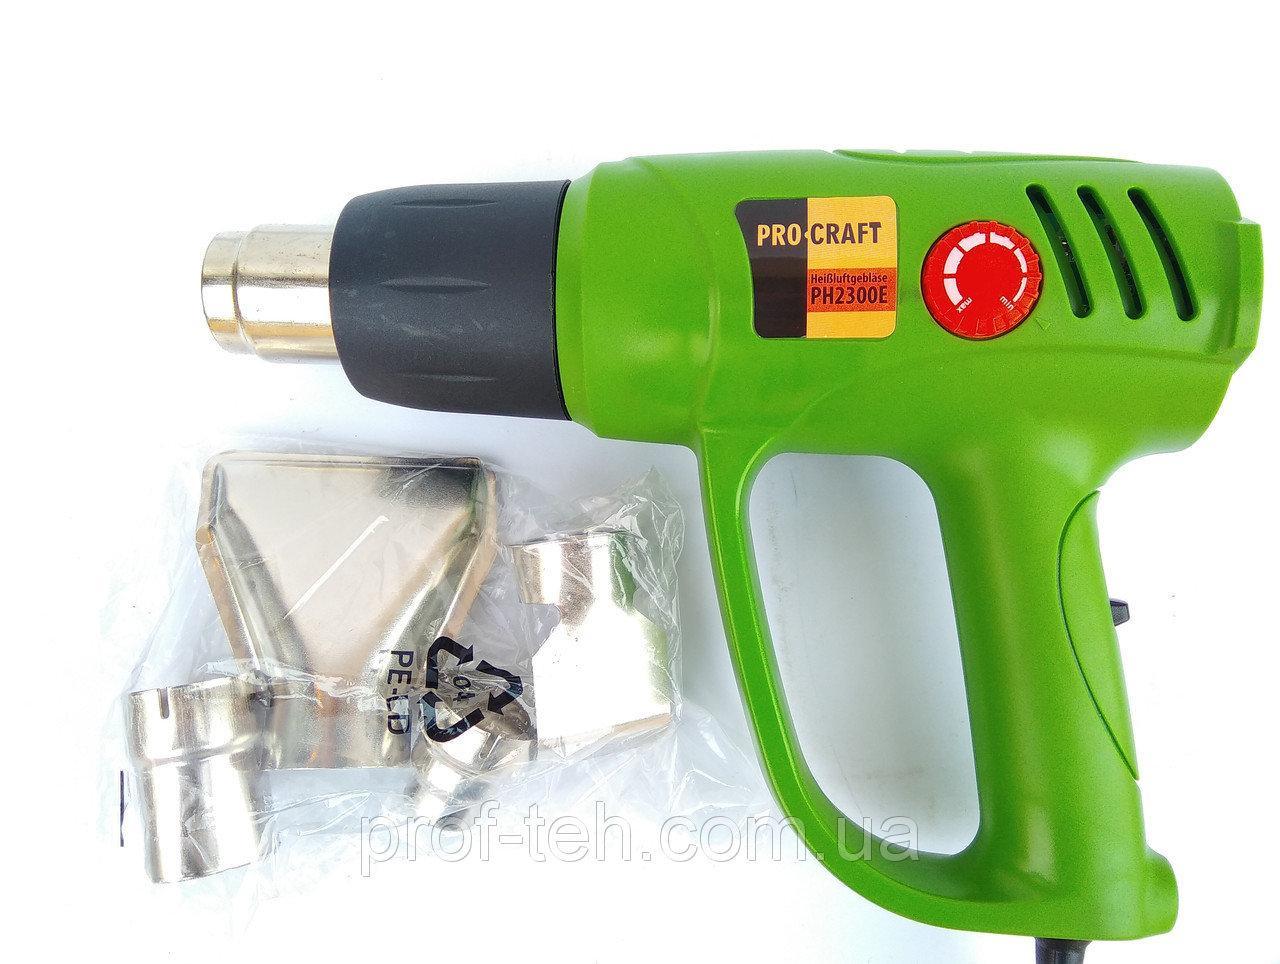 Фен промышленный Procraft PH2300E (PH2300E)